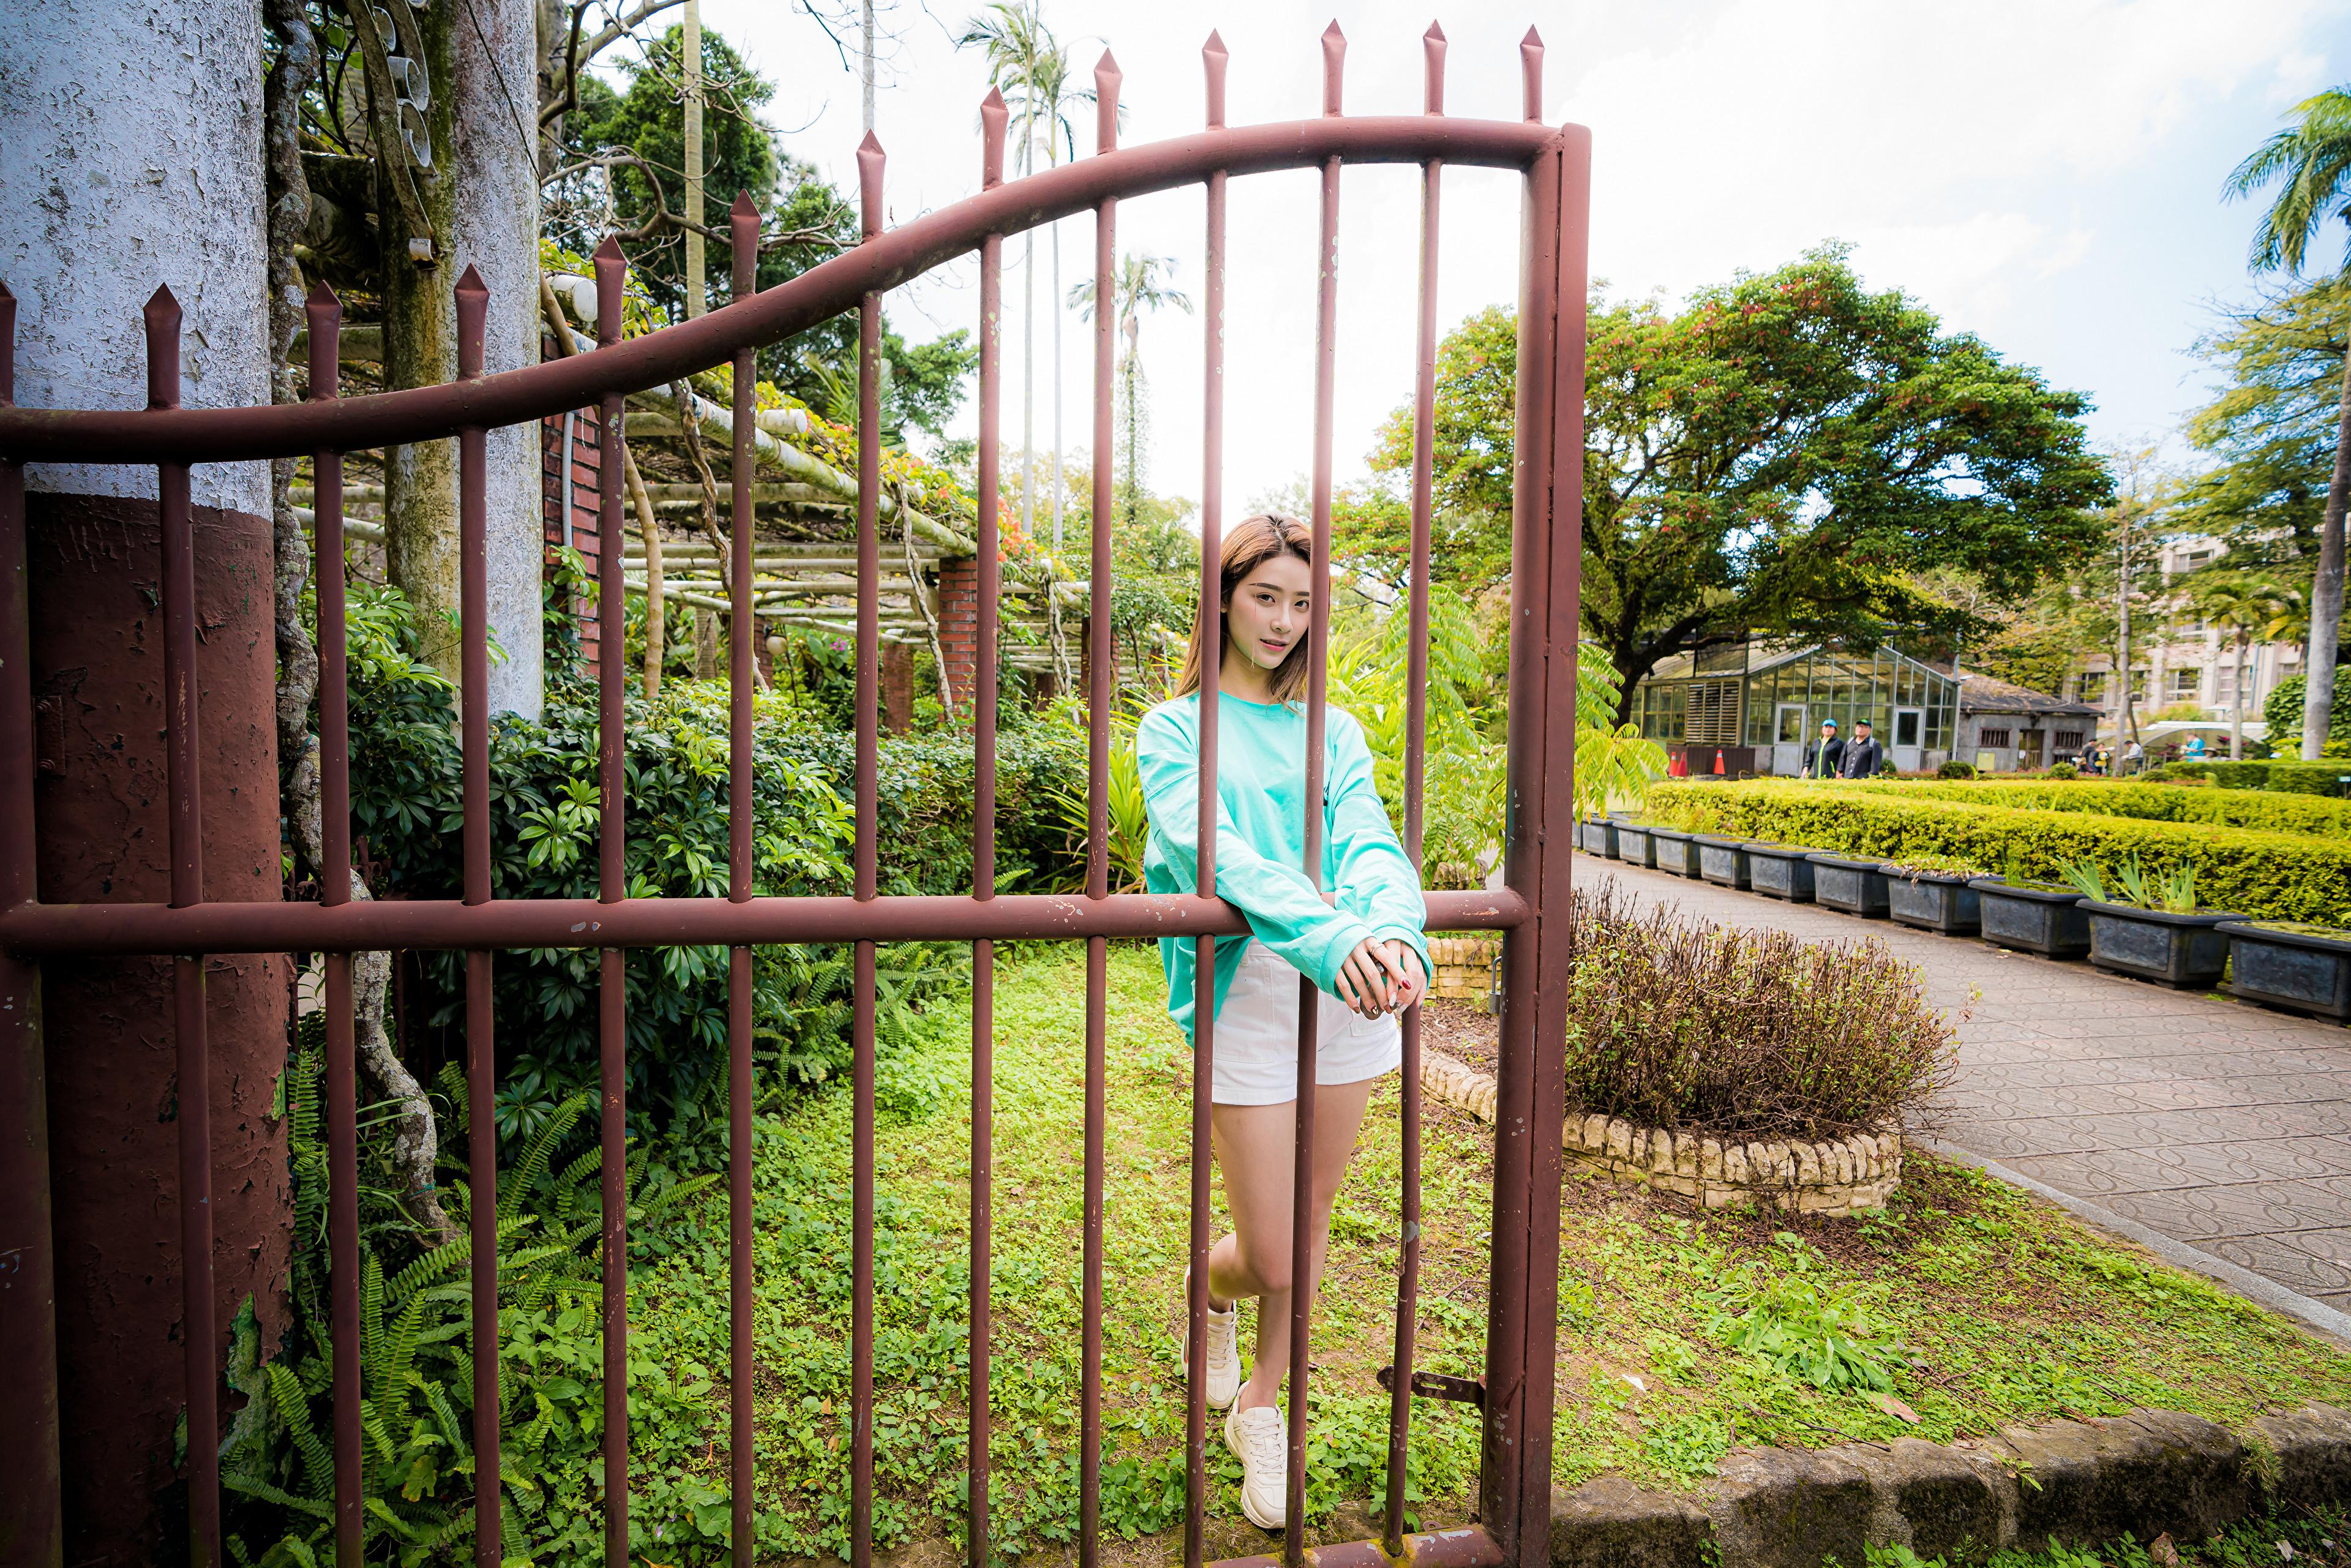 Asian Model Women Women Outdoors Long Hair Dark Hair Depth Of Field Bushes Trees Grass Shorts Sweate 3840x2561